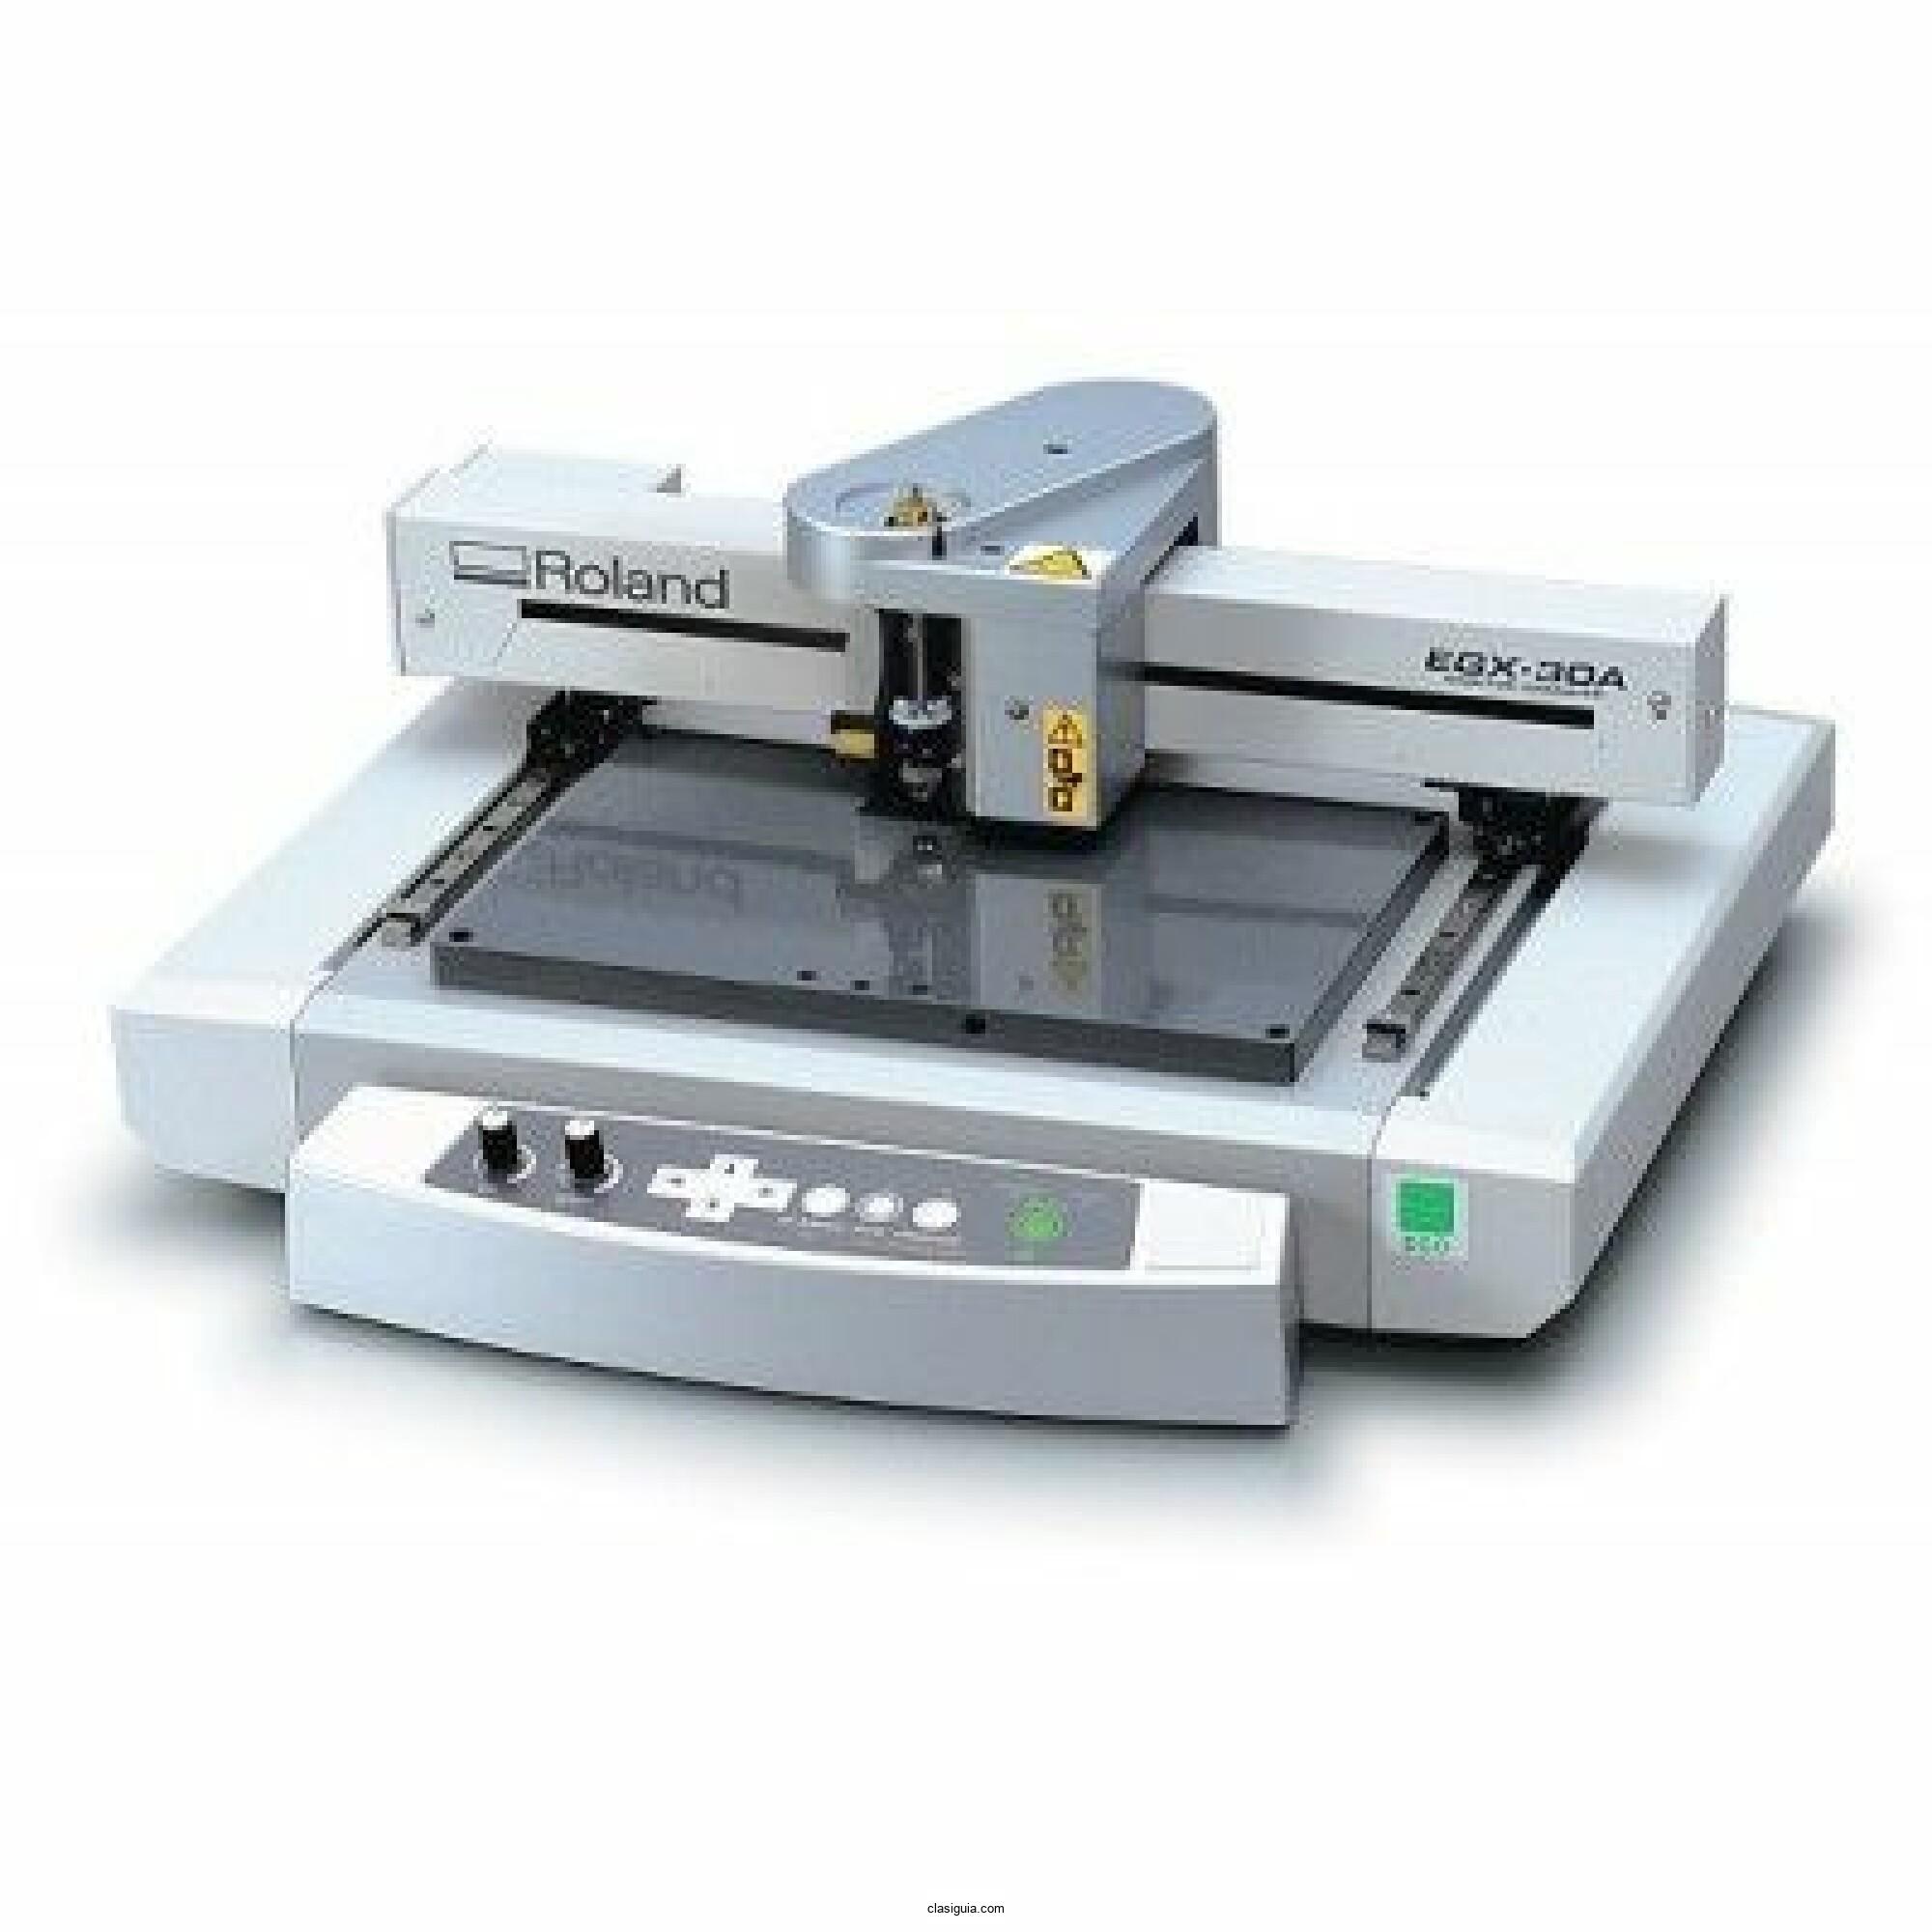 Roland EGX-30A Desktop Rotary Engraver (MITRA PRINT)